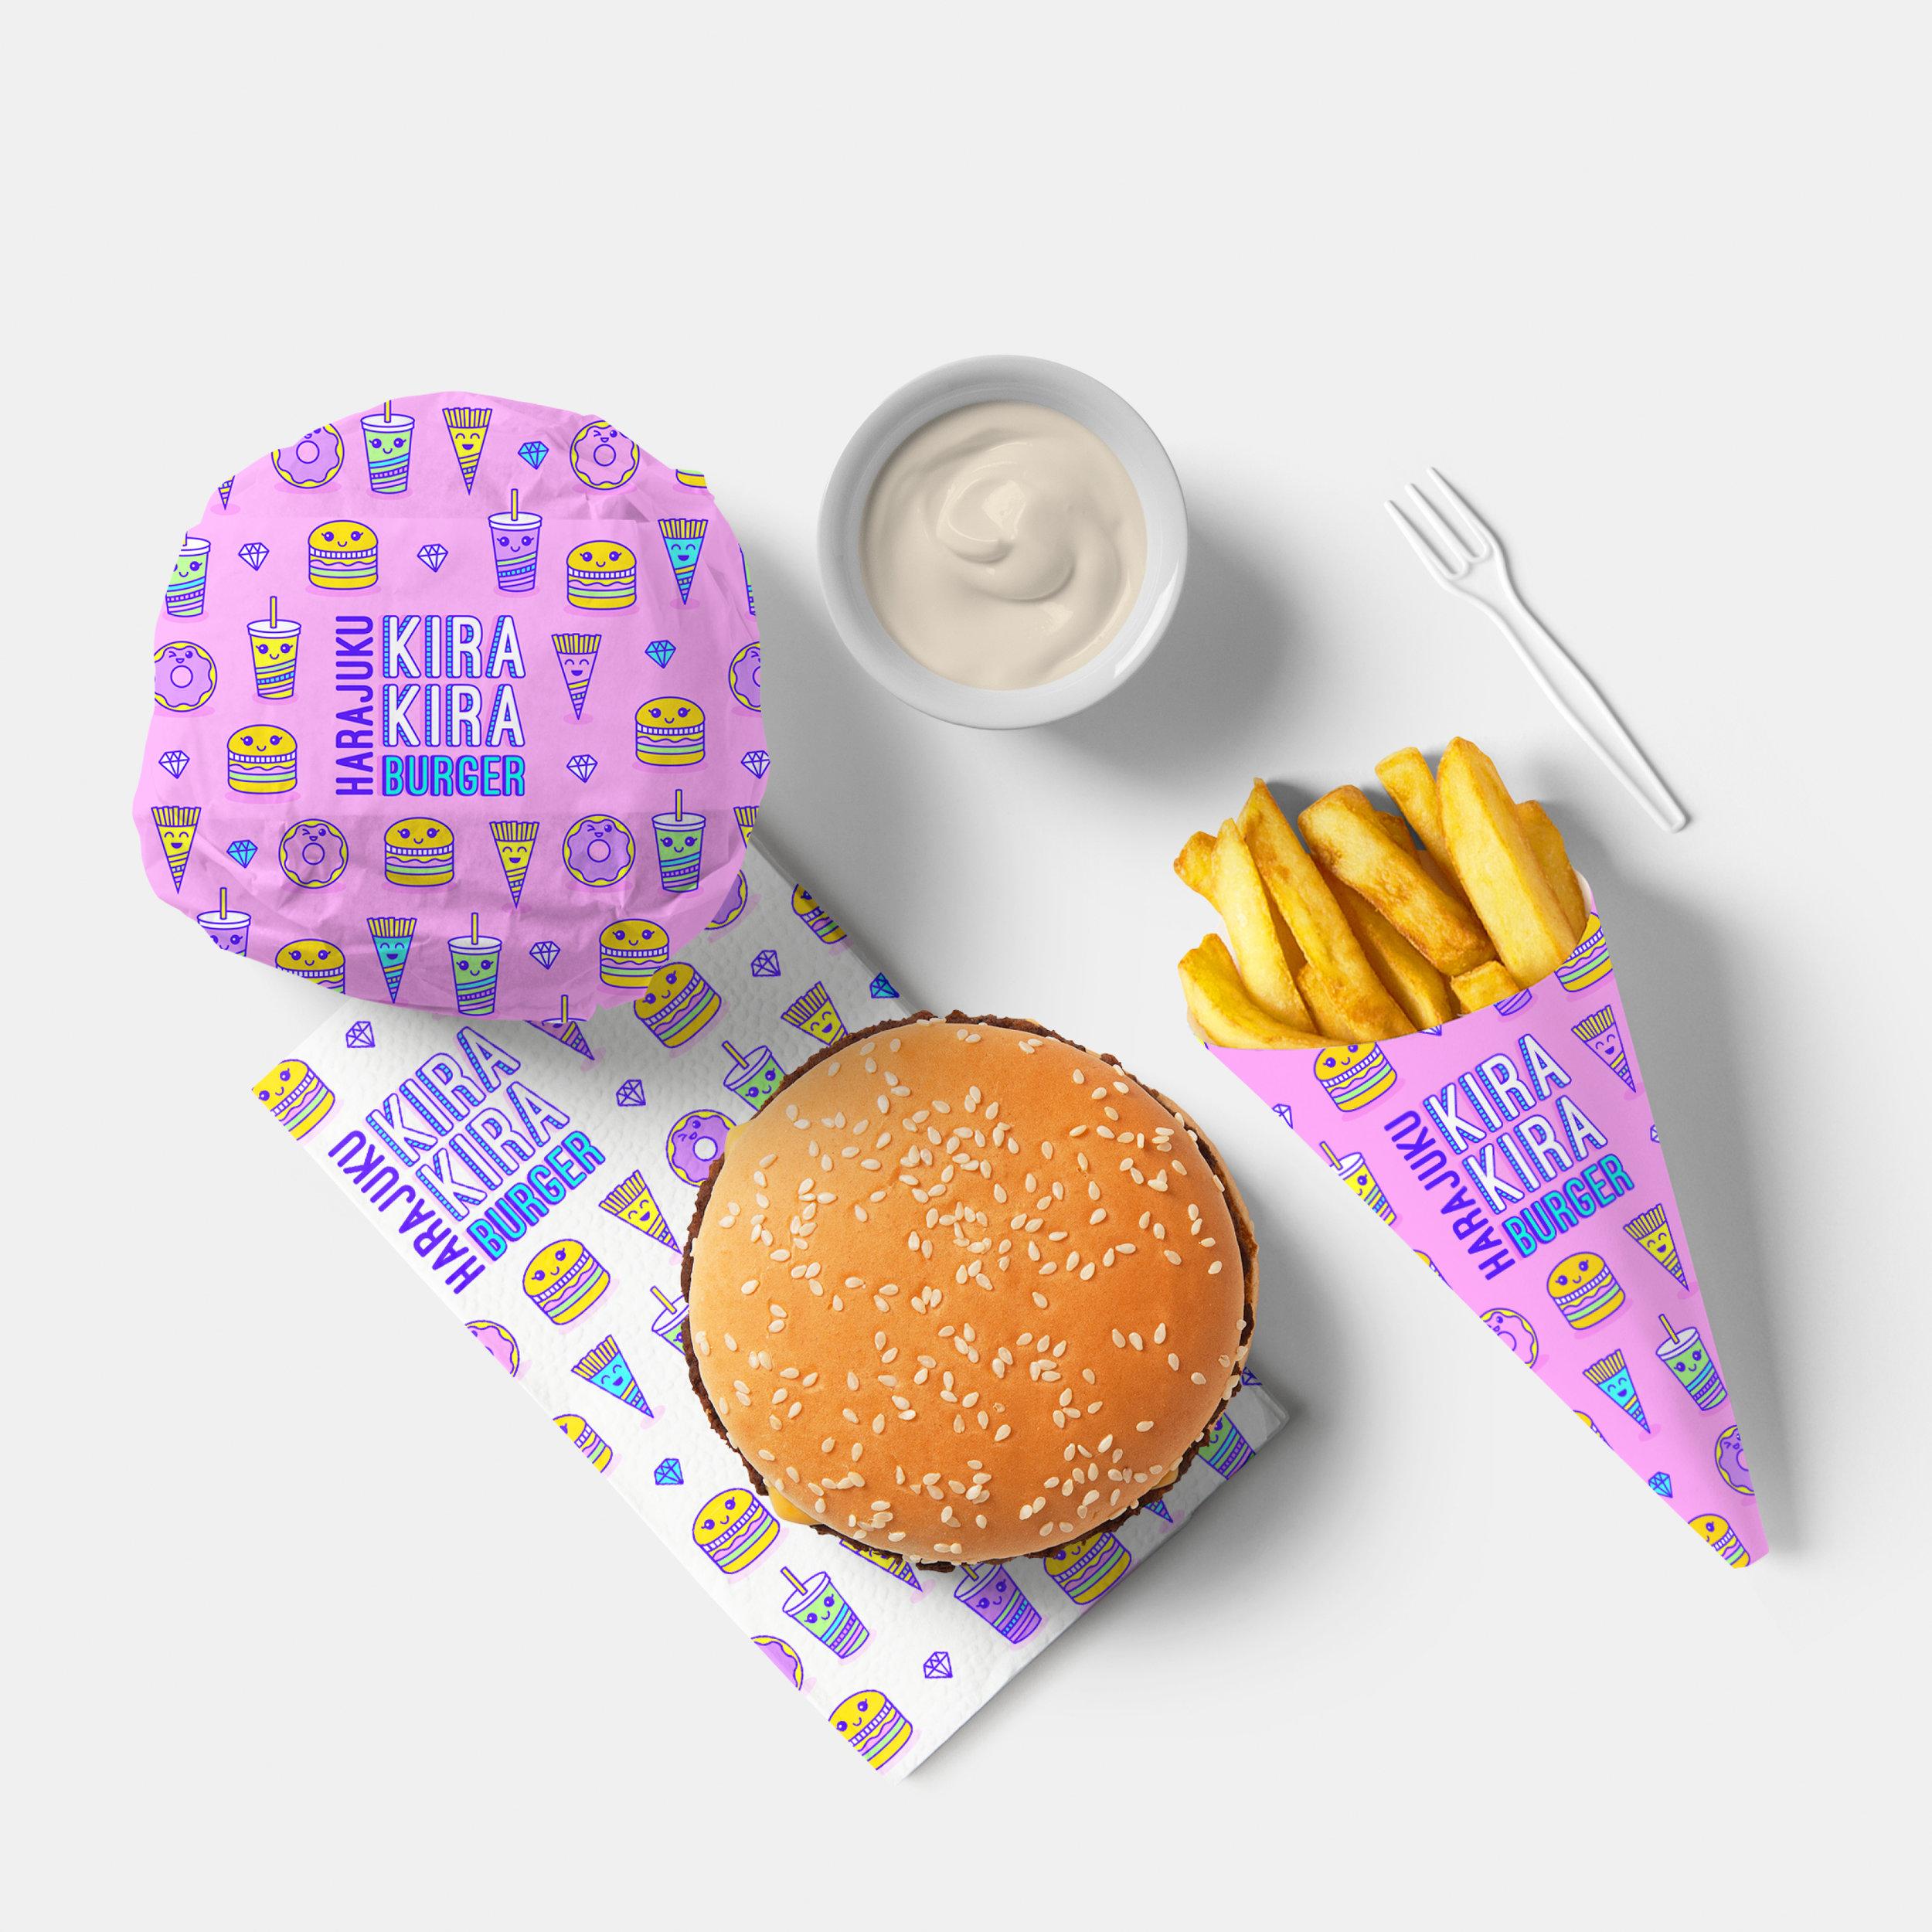 Shanti-Sparrow-harajuku-kira-kira-burger-packaging-design